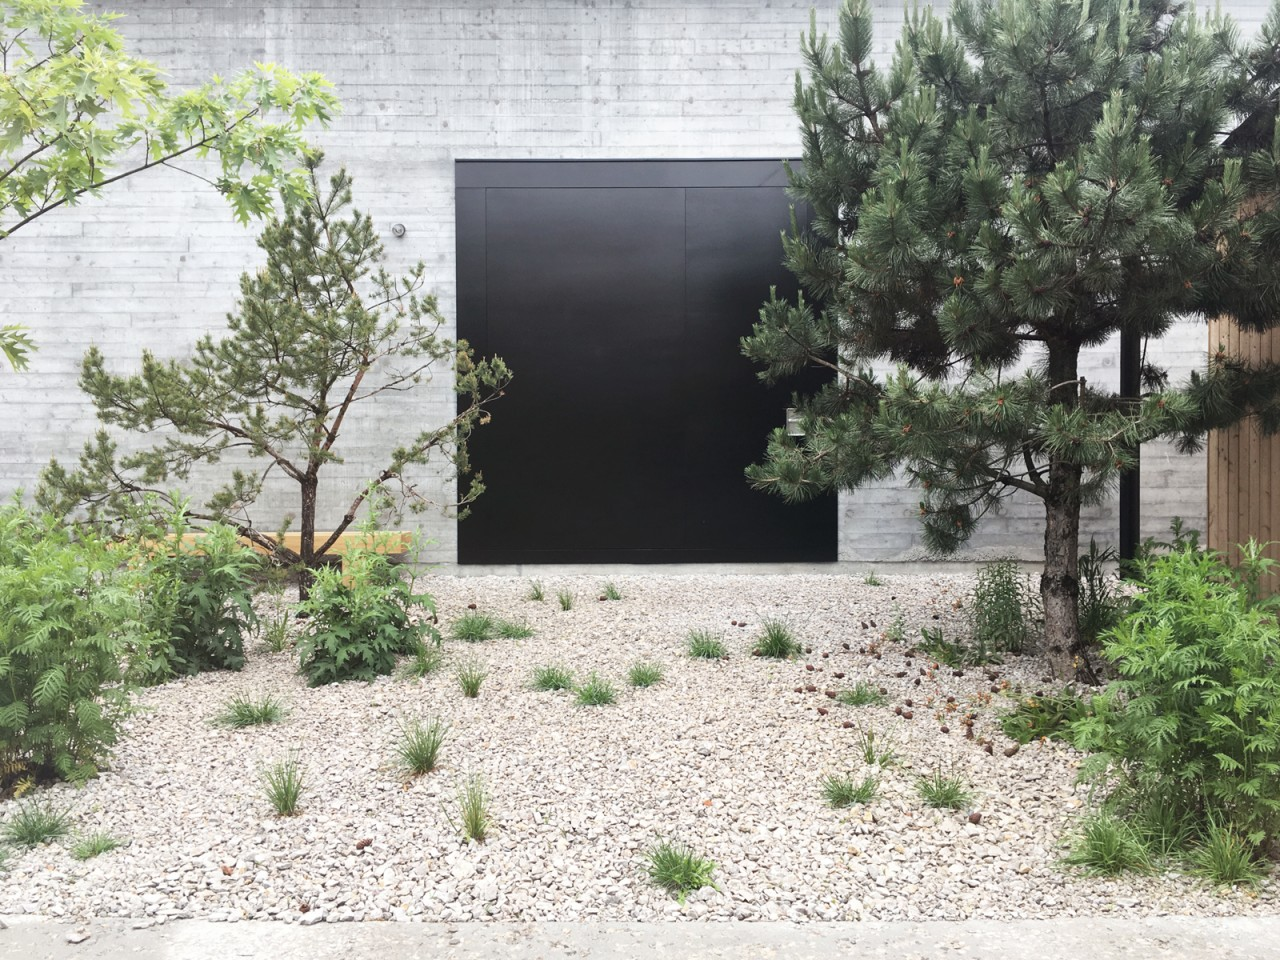 Landscape Practice The Artist's Garden